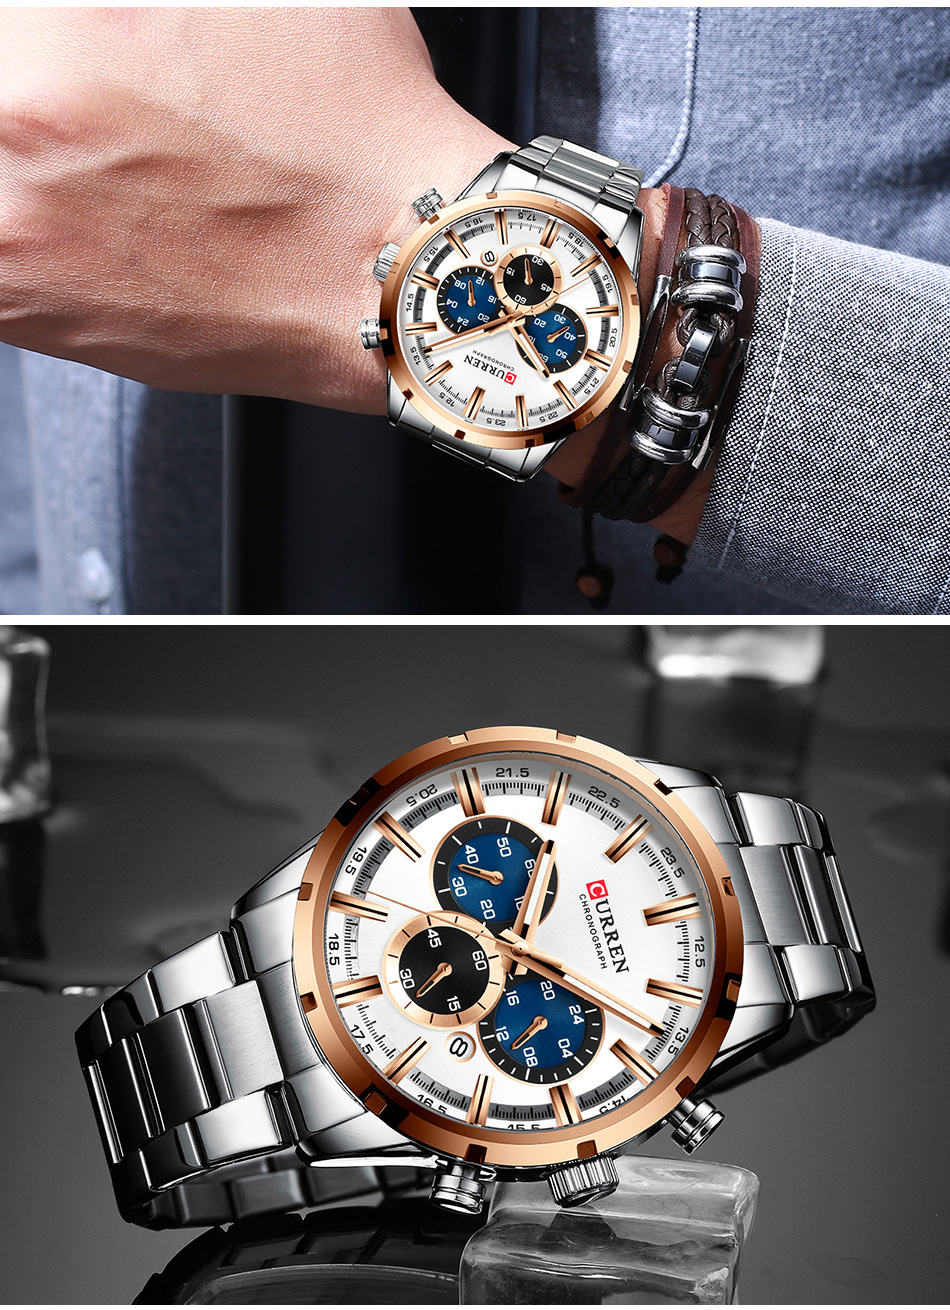 H87637ad637144c08838a727a6682f87aV CURREN Men Watch Top Brand Luxury Sports Quartz Mens Watches Full Steel Waterproof Chronograph Wristwatch Men Relogio Masculino